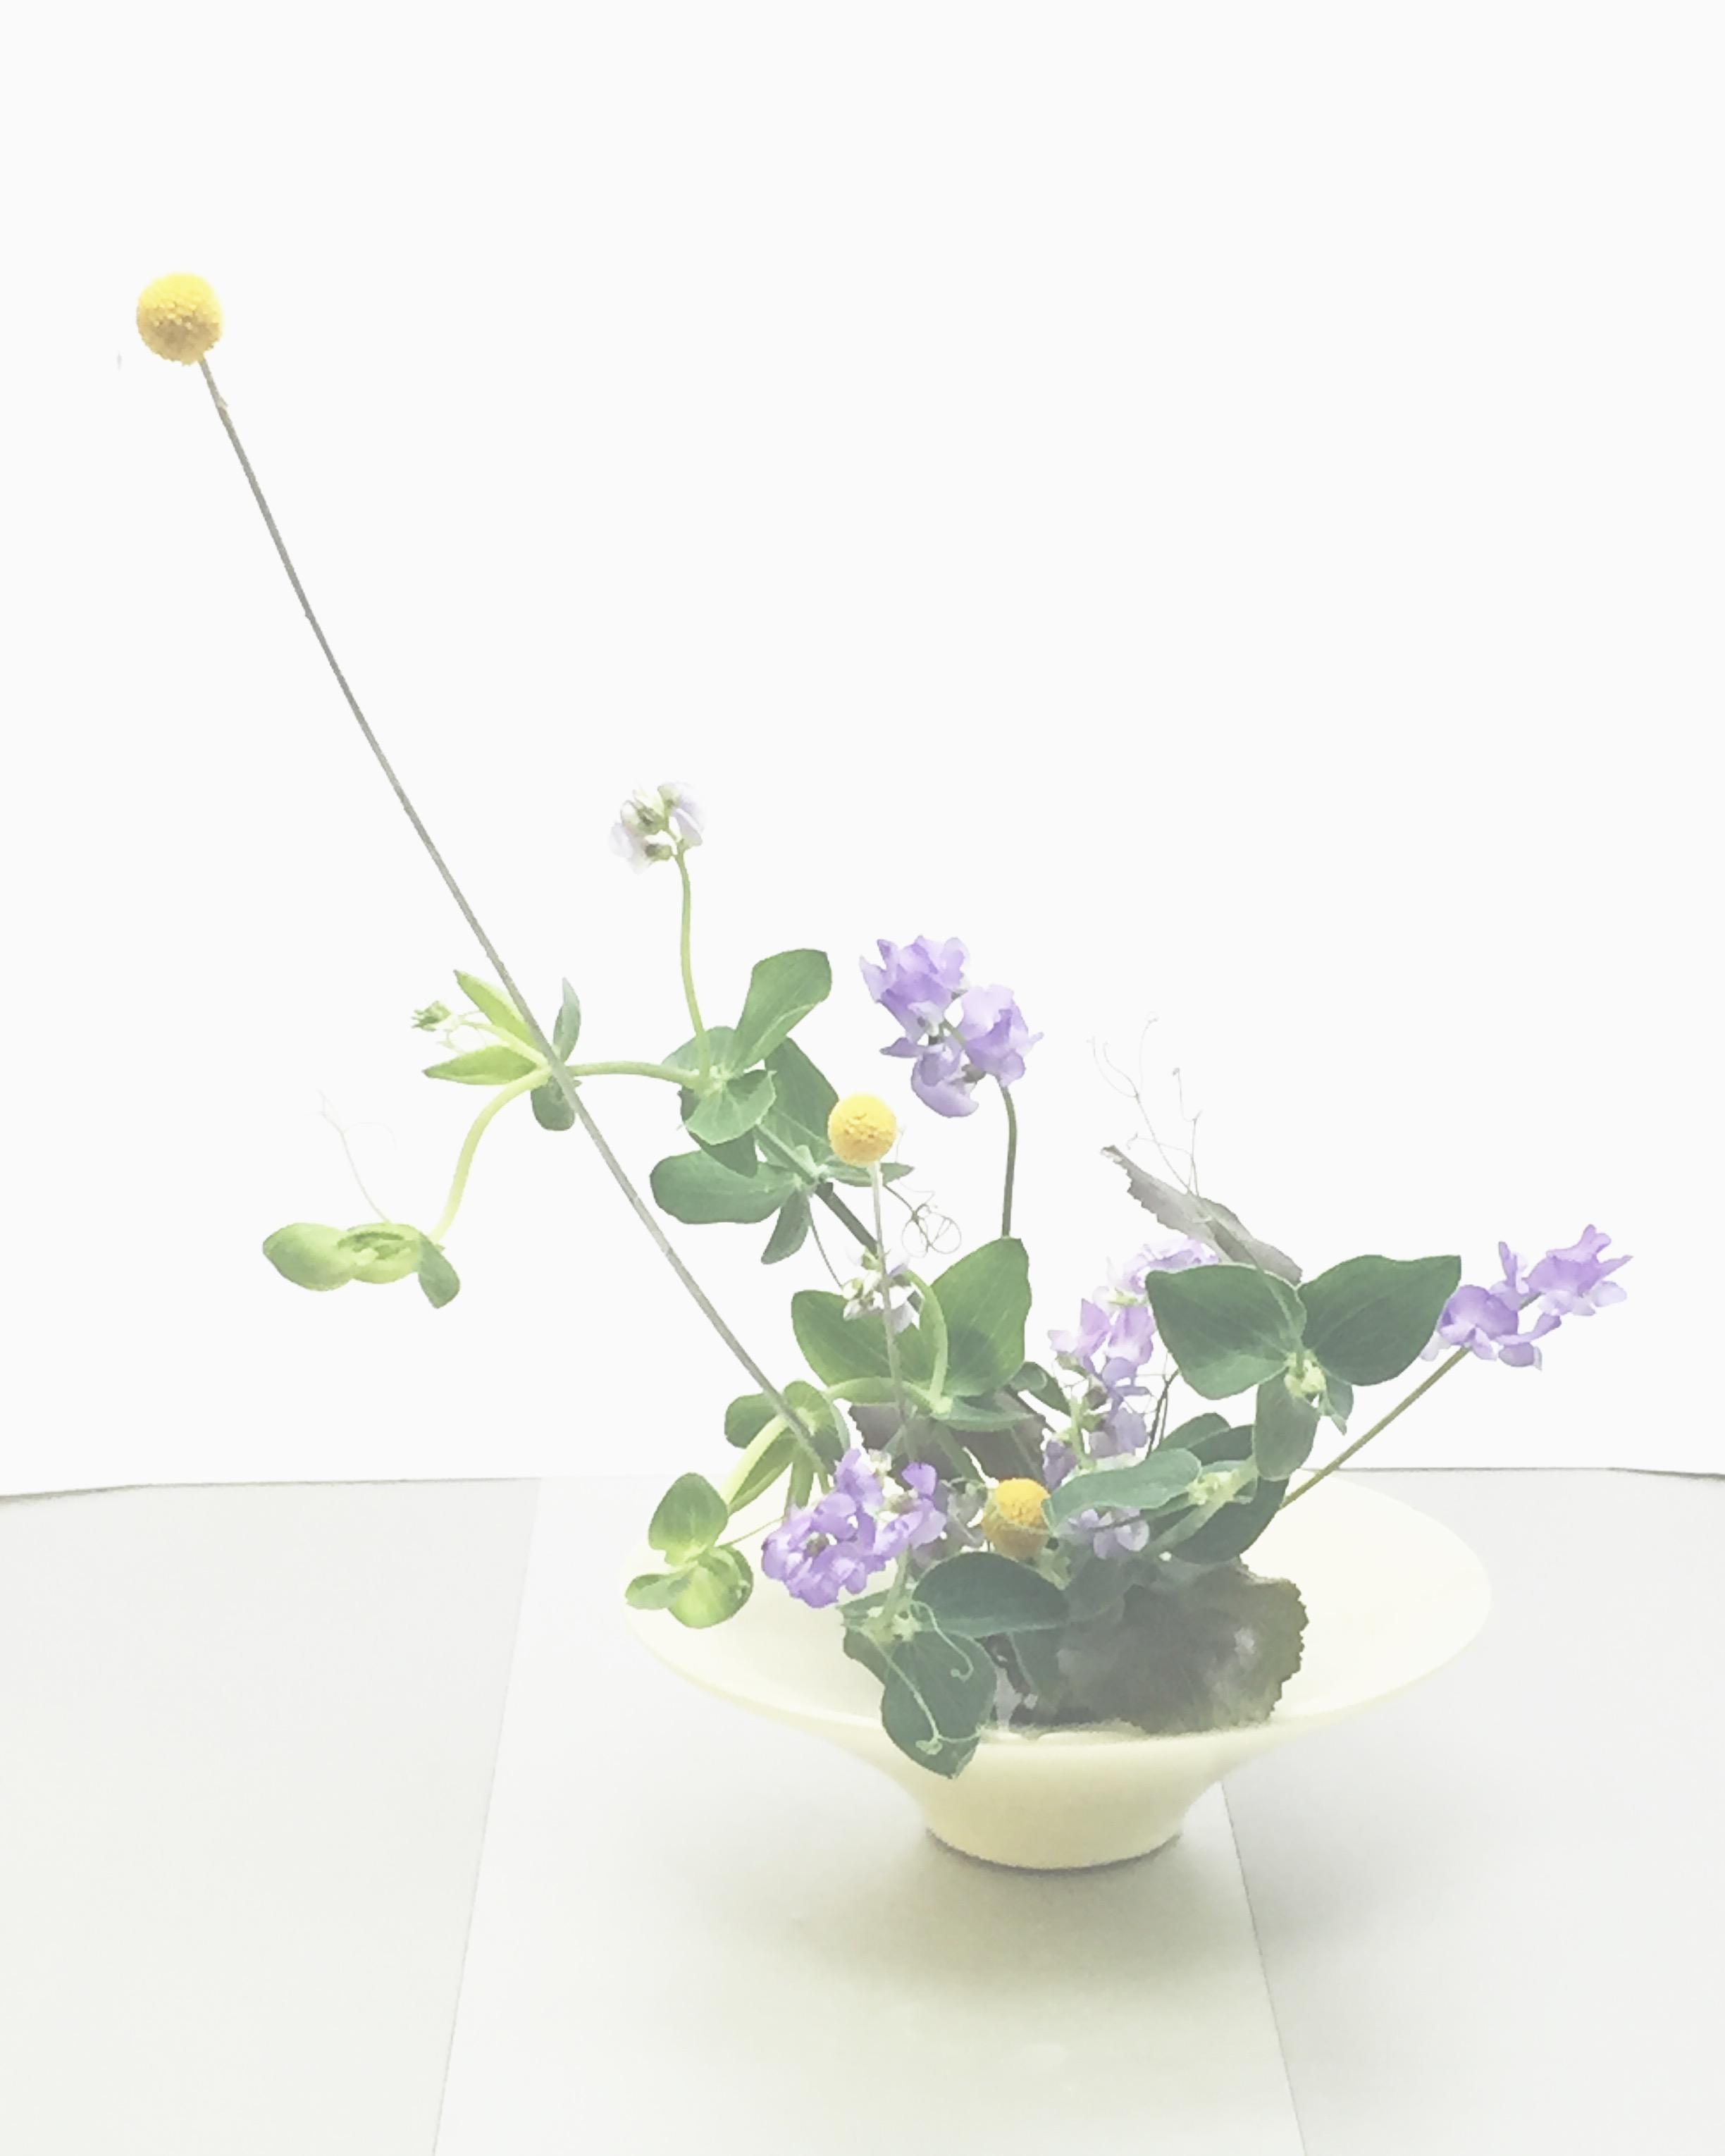 My arrangement today sweet pea, craspedia, galax leaf. #nodaikebanaclass  #ikenobo  #ikebana  #flowers  #sweetpea